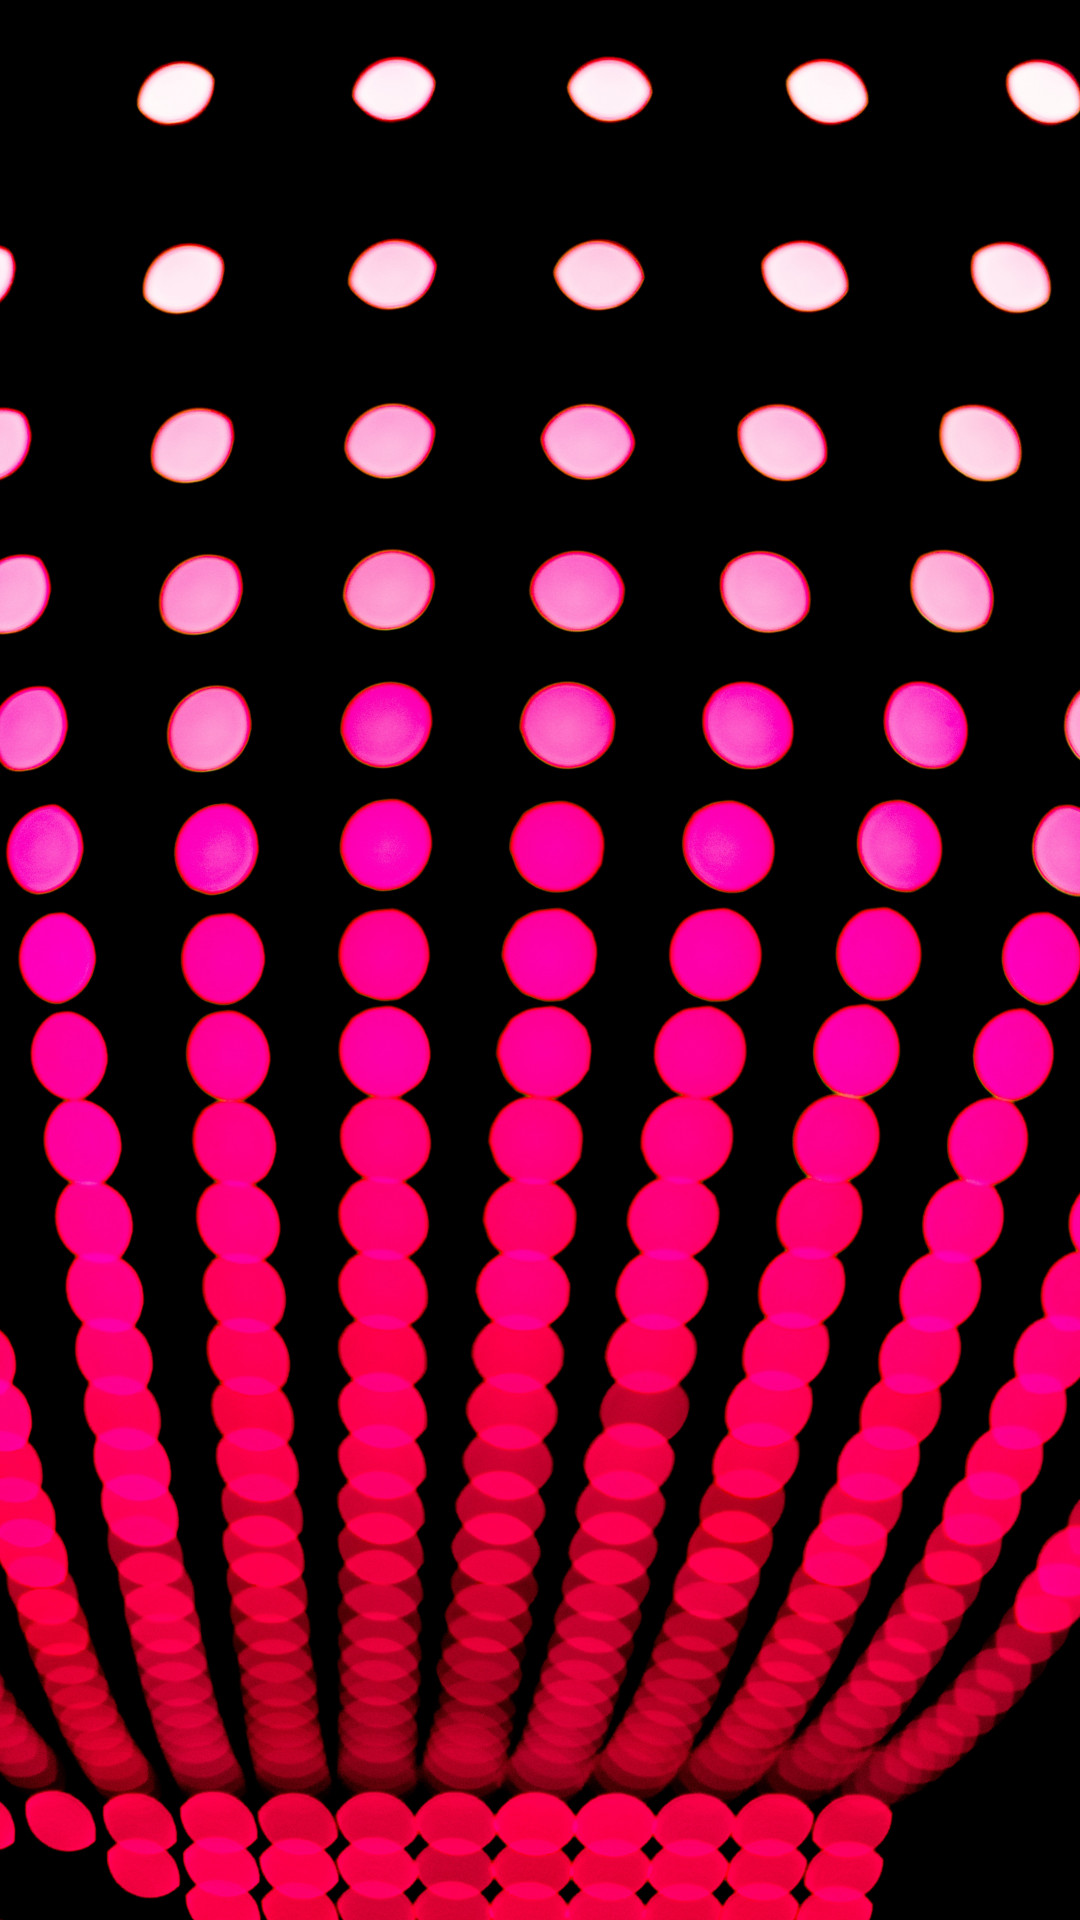 Neon Dot Iphone Wallpaper